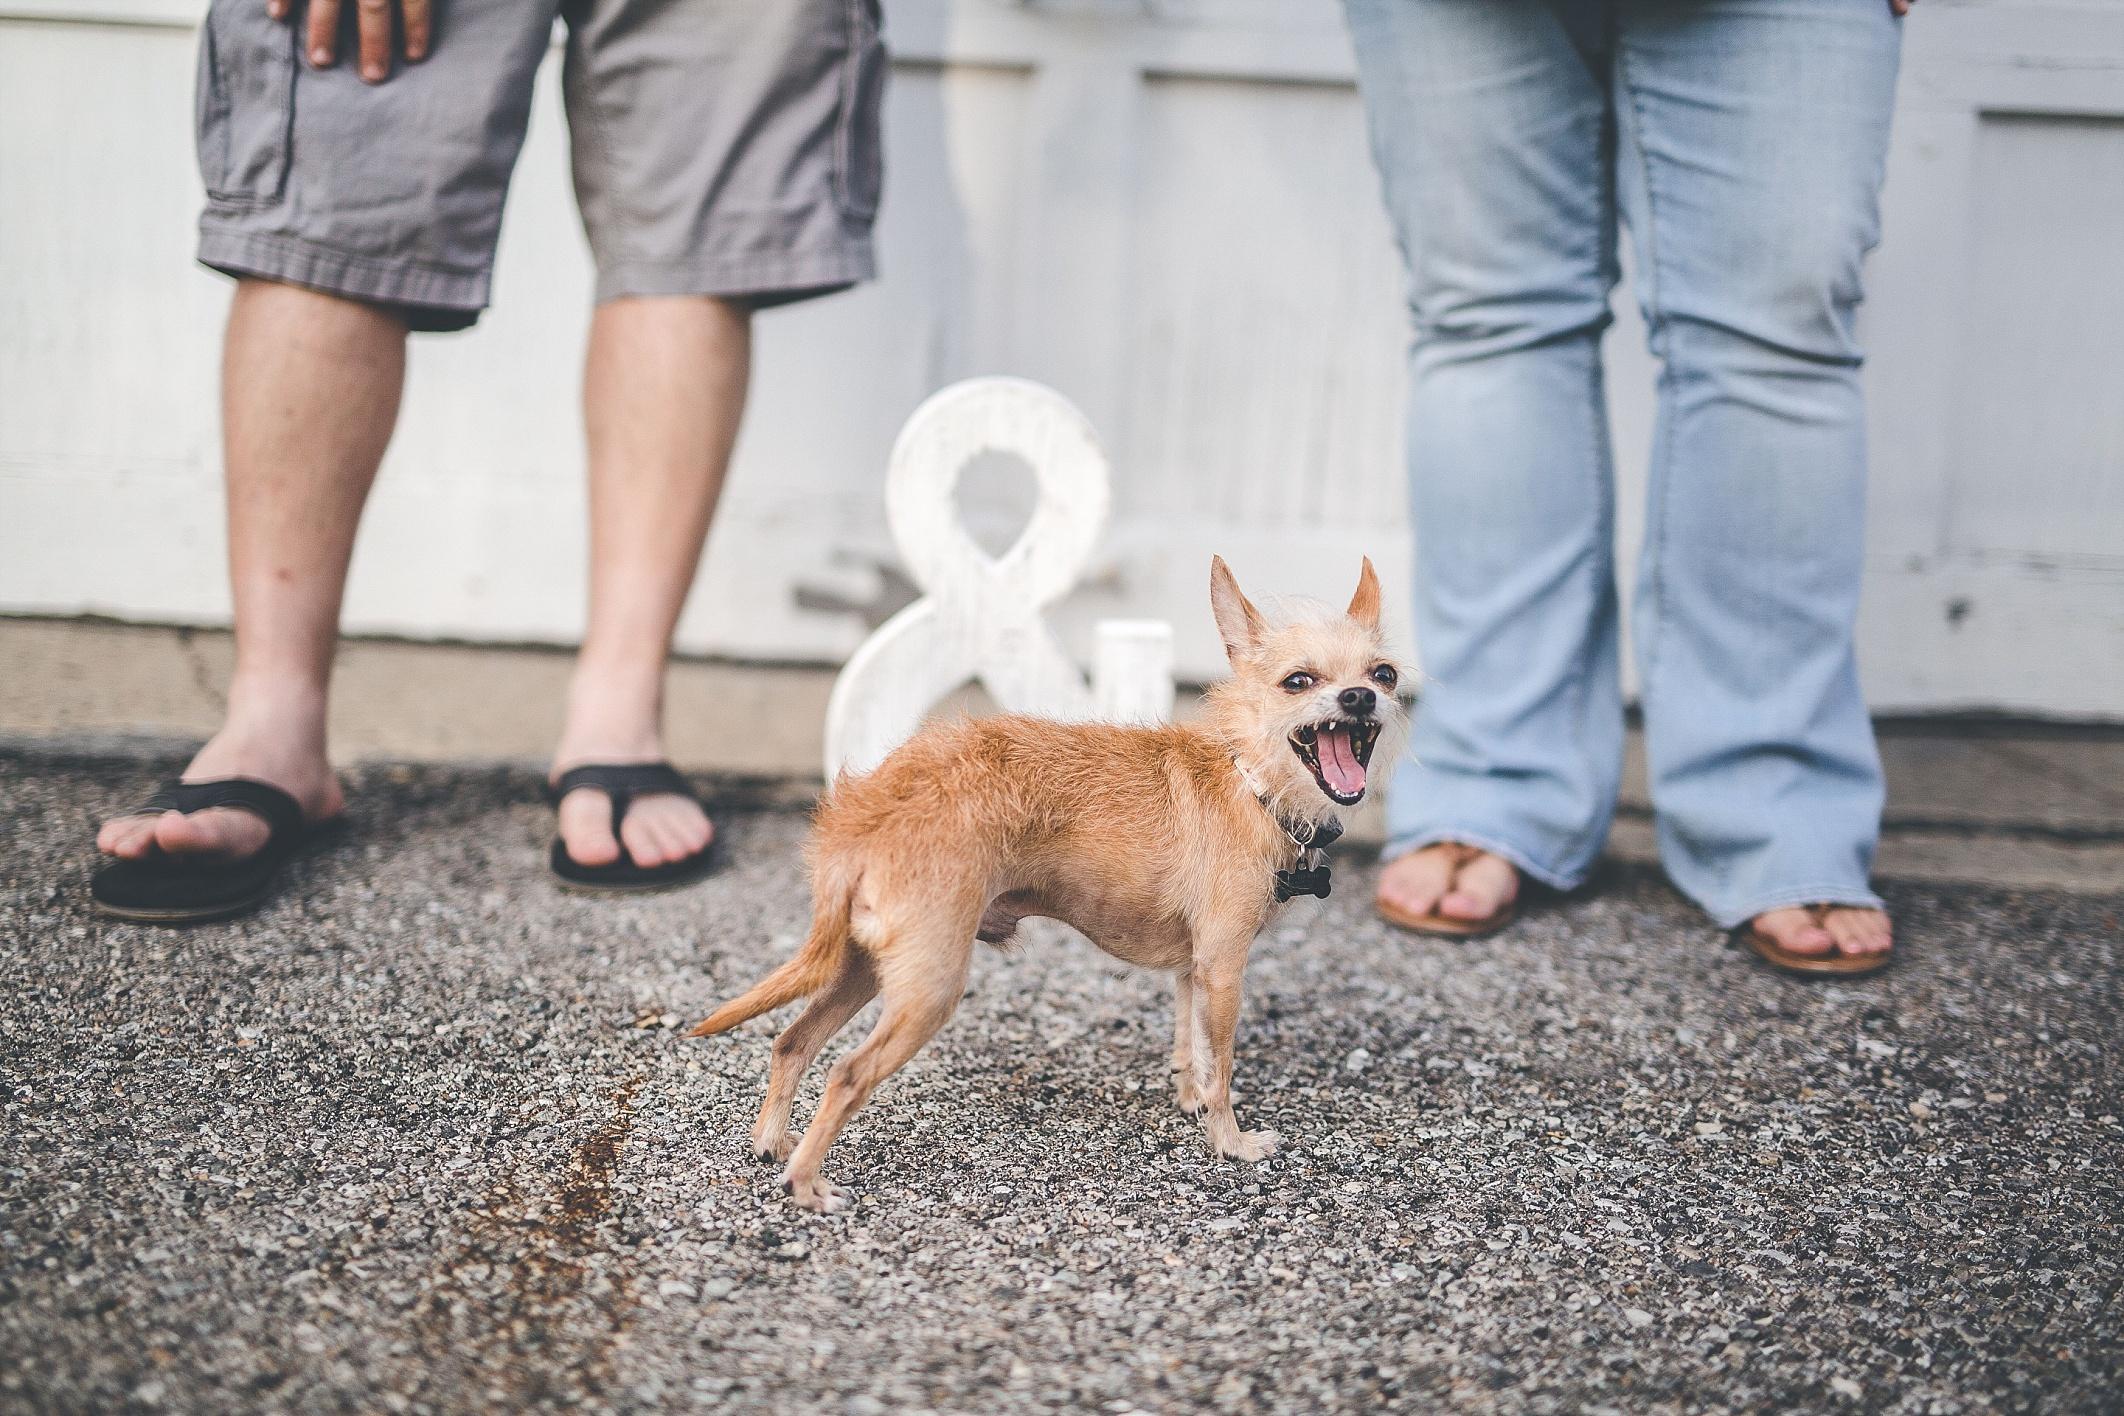 engagement-photographer--miamisburg-germantown-ohio-oregon_0064.jpg